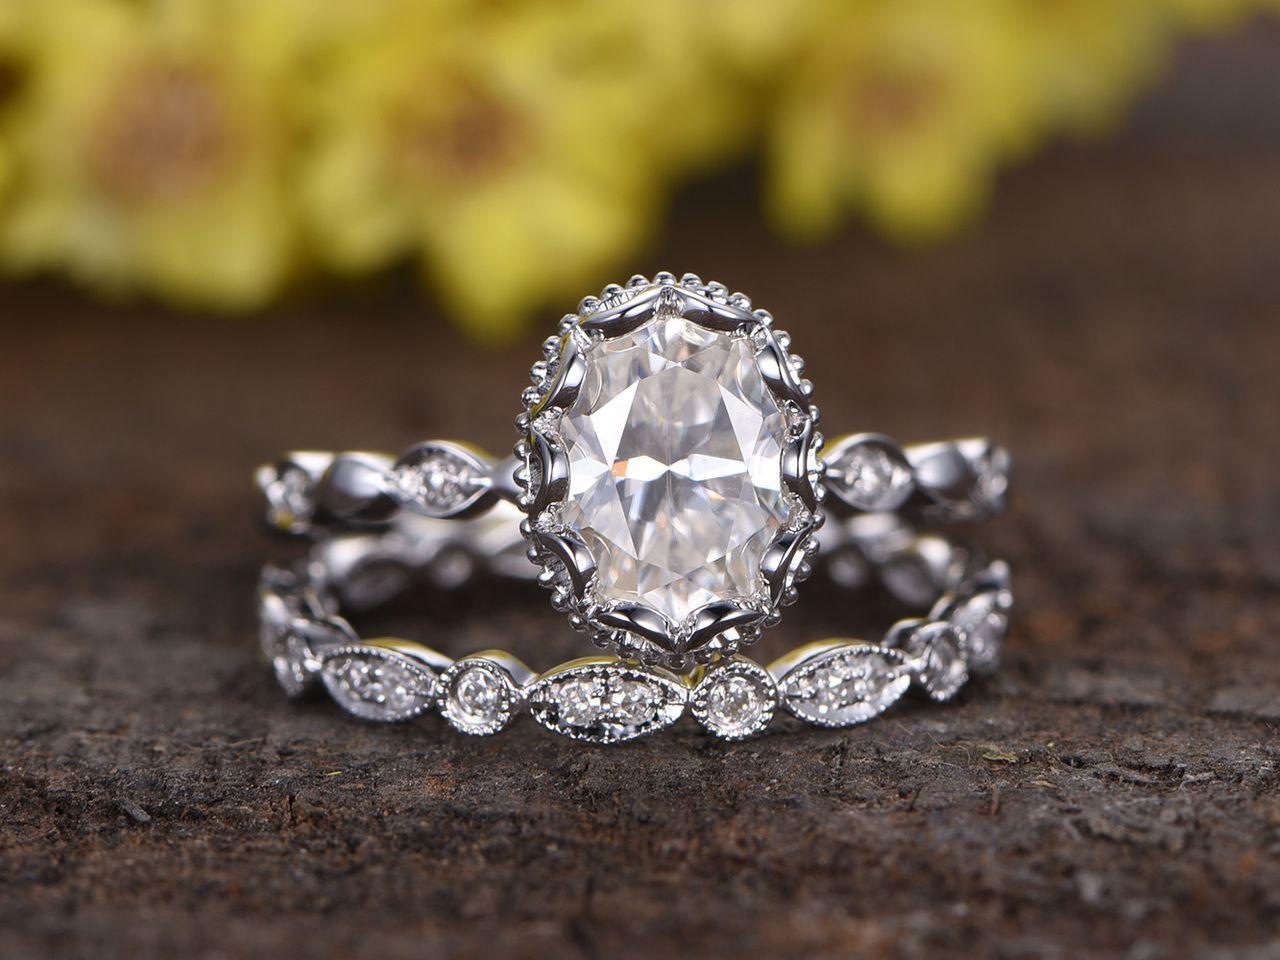 1.5 Carat Oval Moissanite Wedding Ring Sets Diamond Full